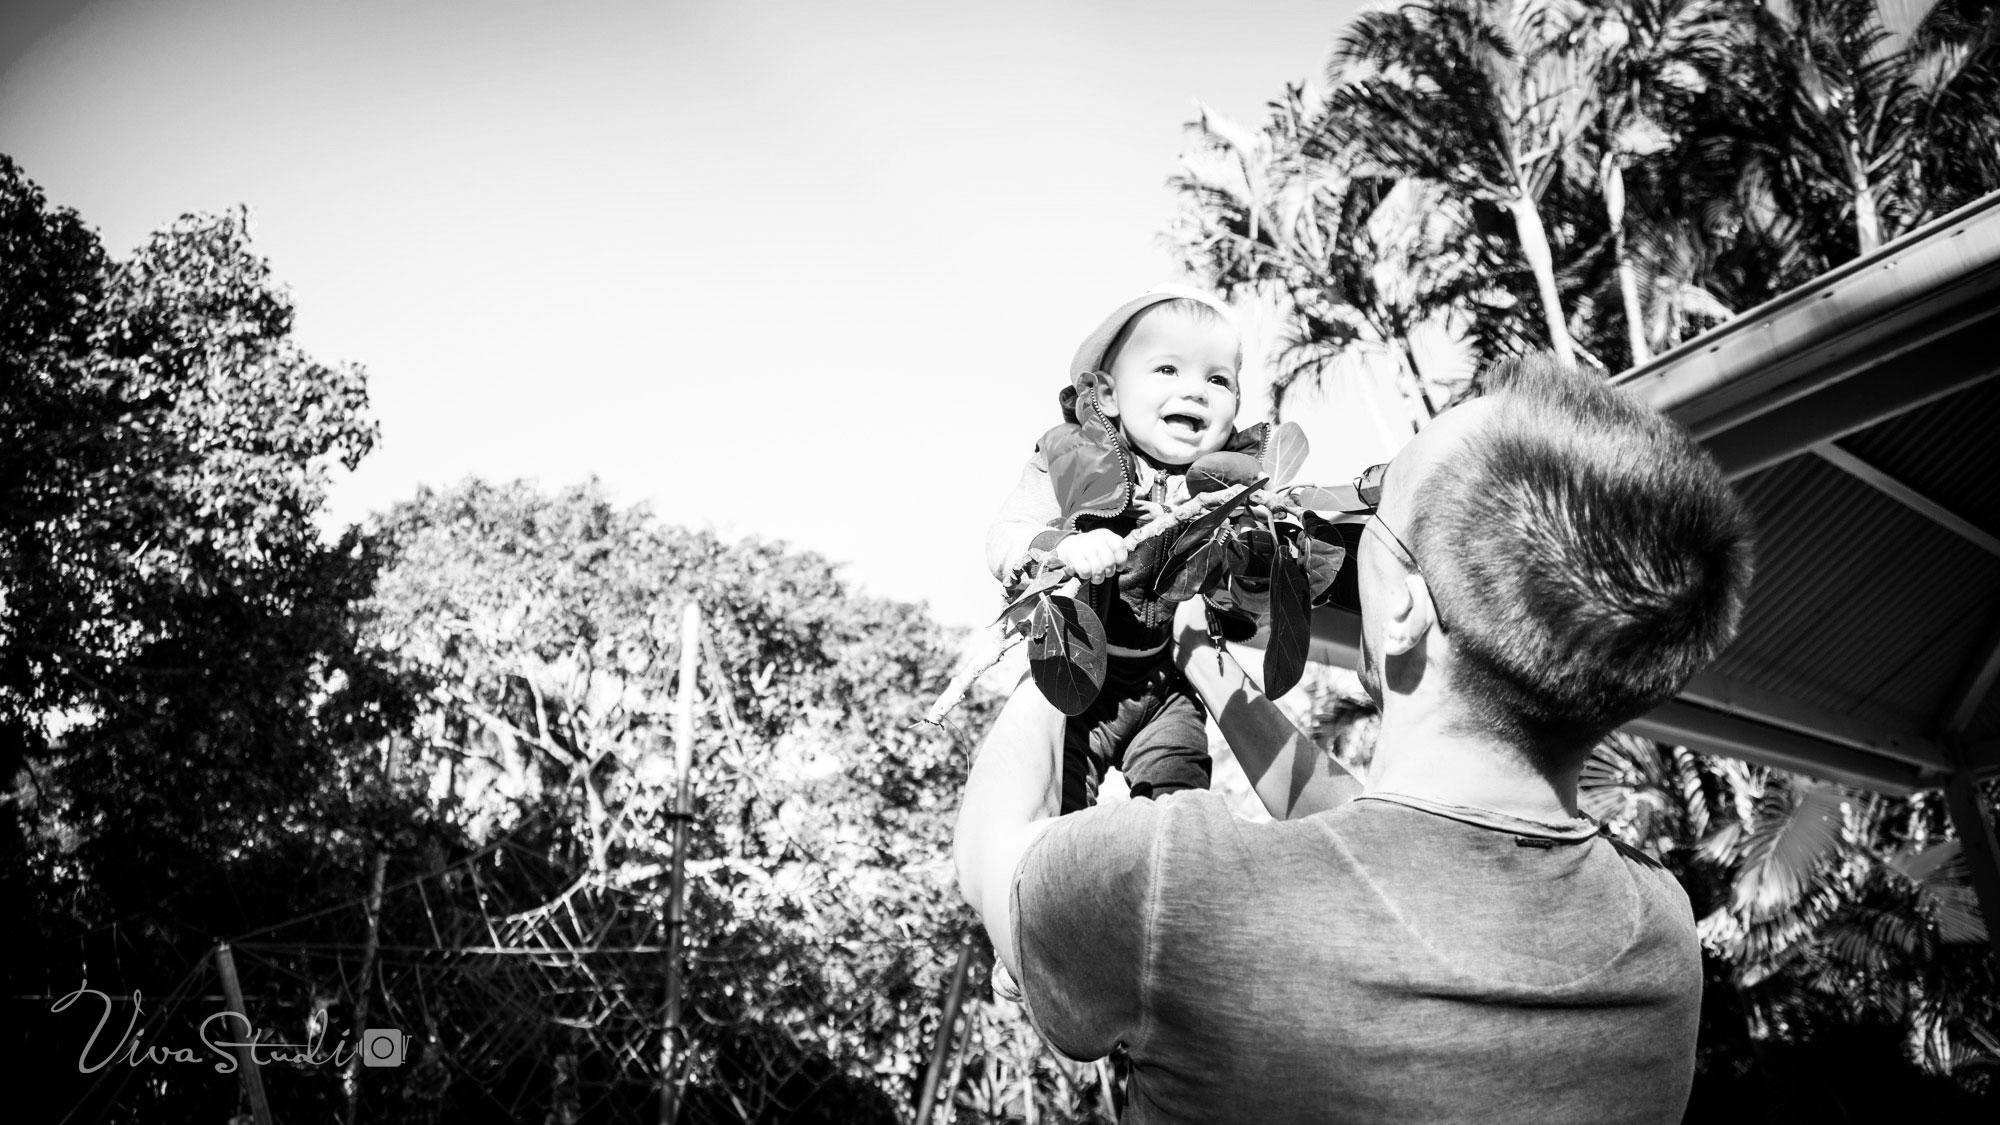 VivaStudio_Baby_Photography_Portrait_Newfarm_Park21